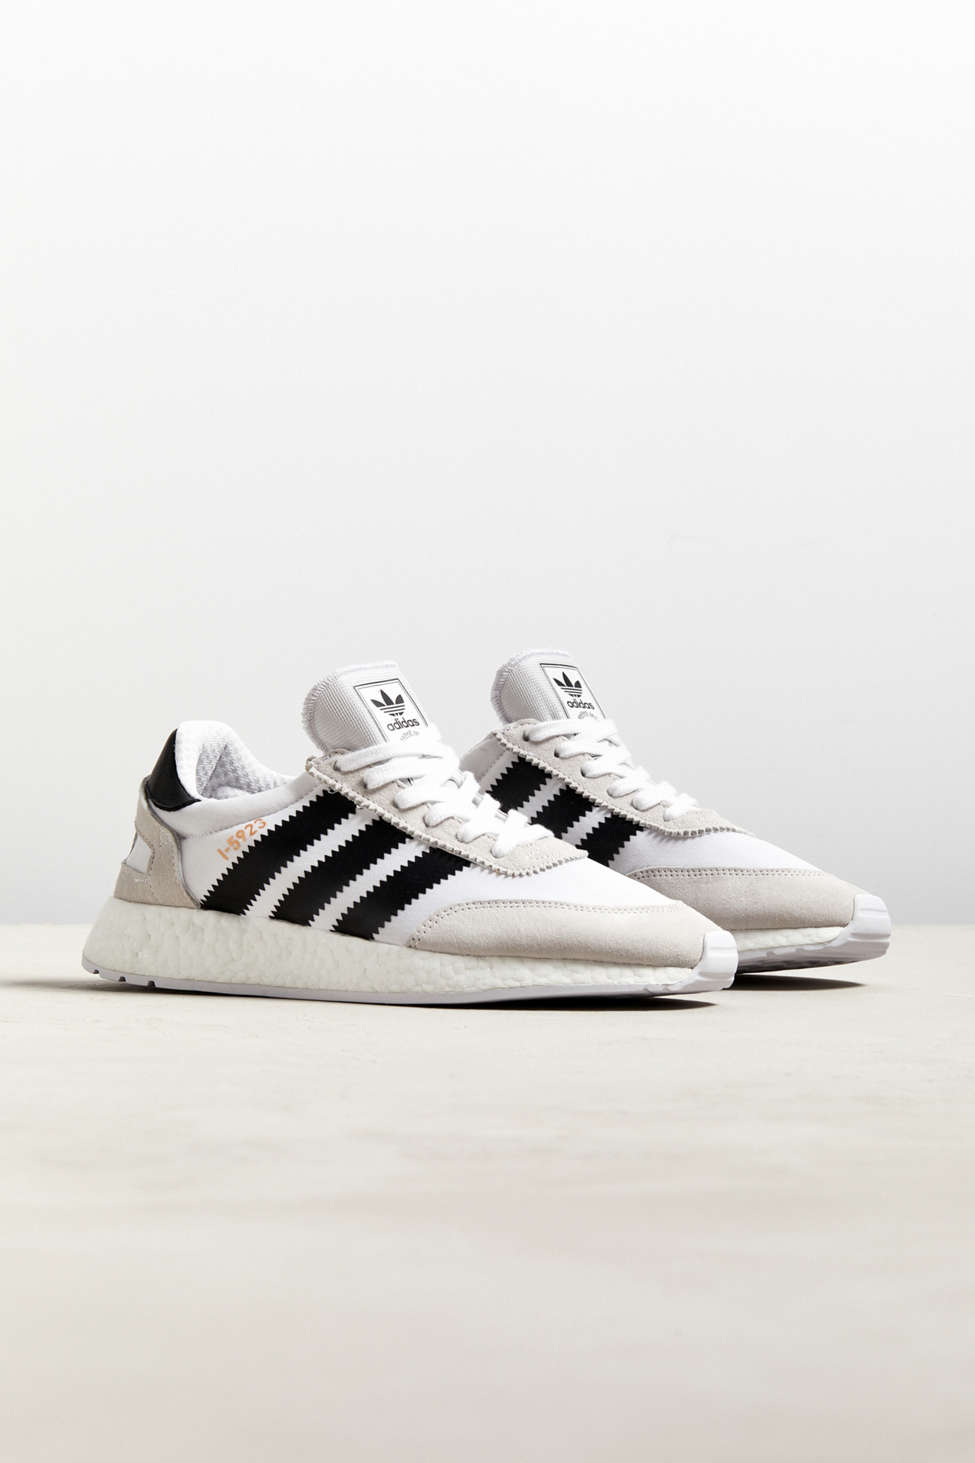 adidas - 5923 urban outfitters di scarpe